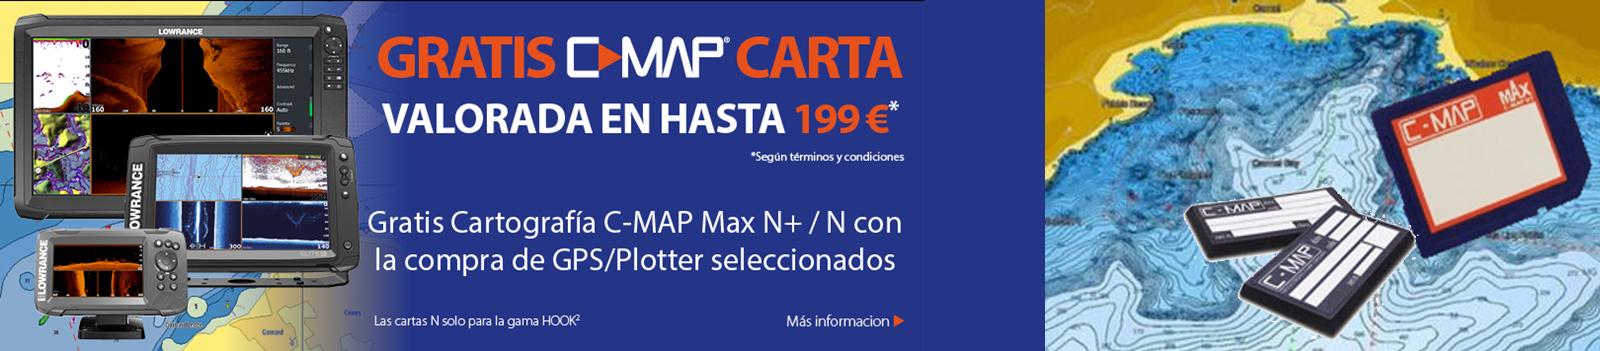 Oferta carta C-Map